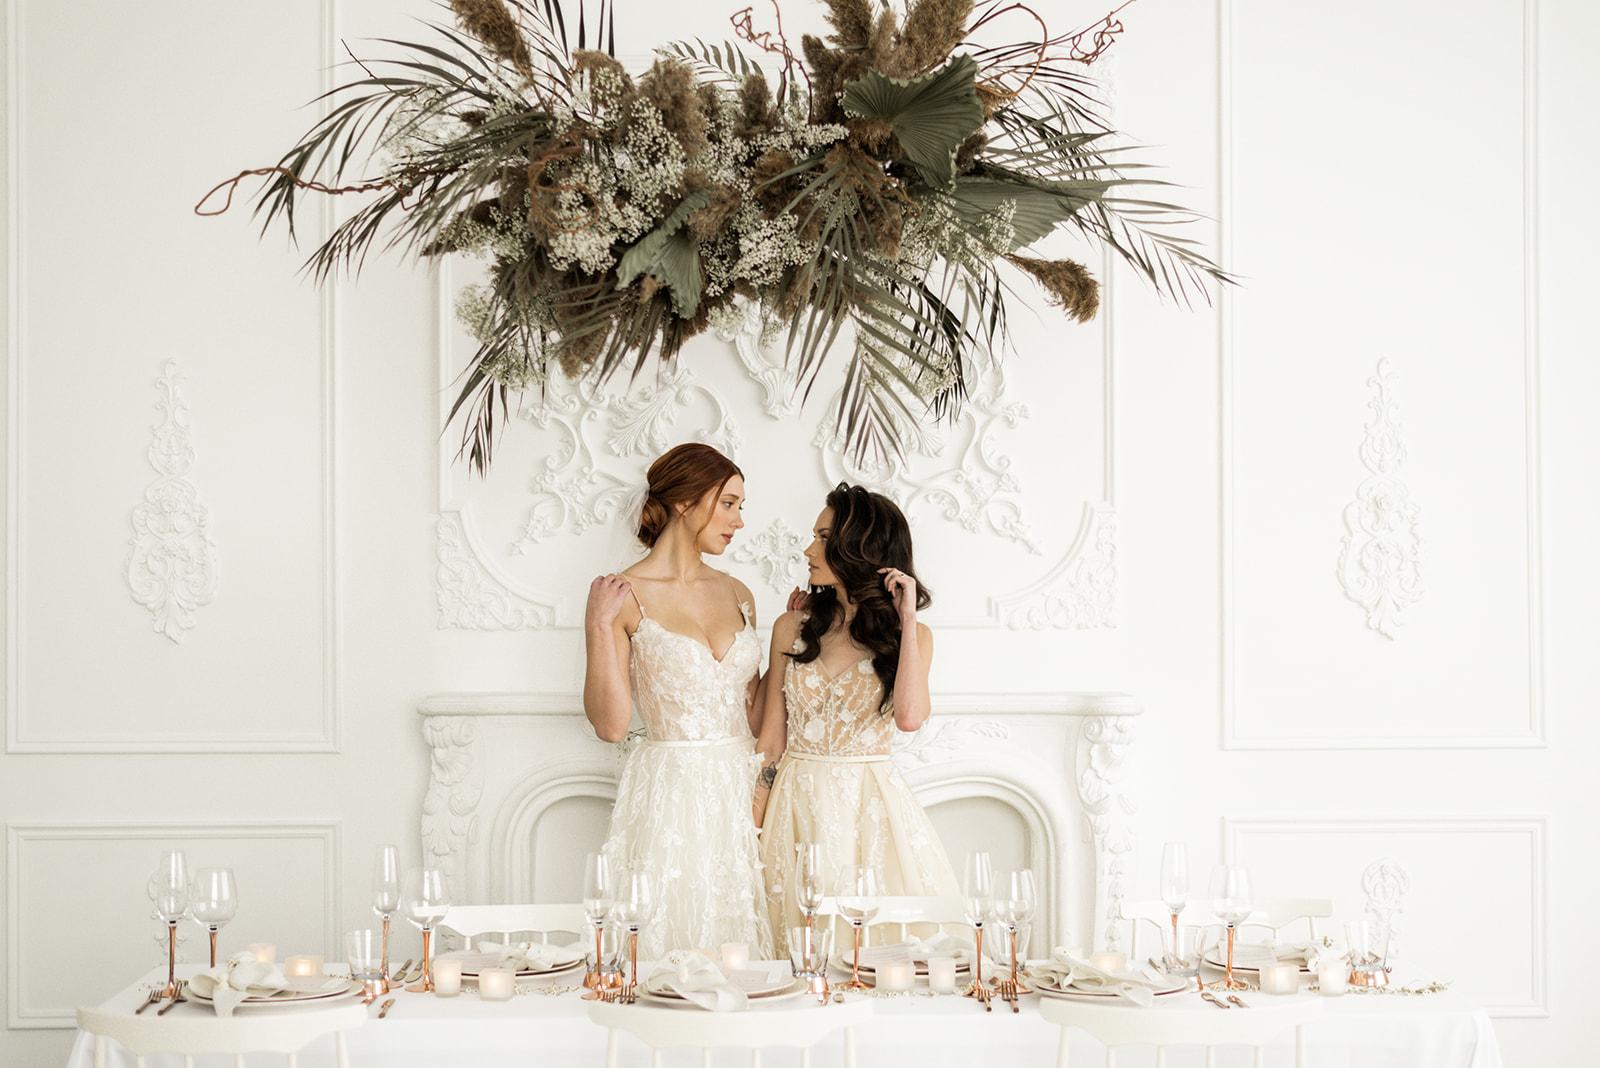 Dancing & Dessert- Toronto Wedding Planner and Designer